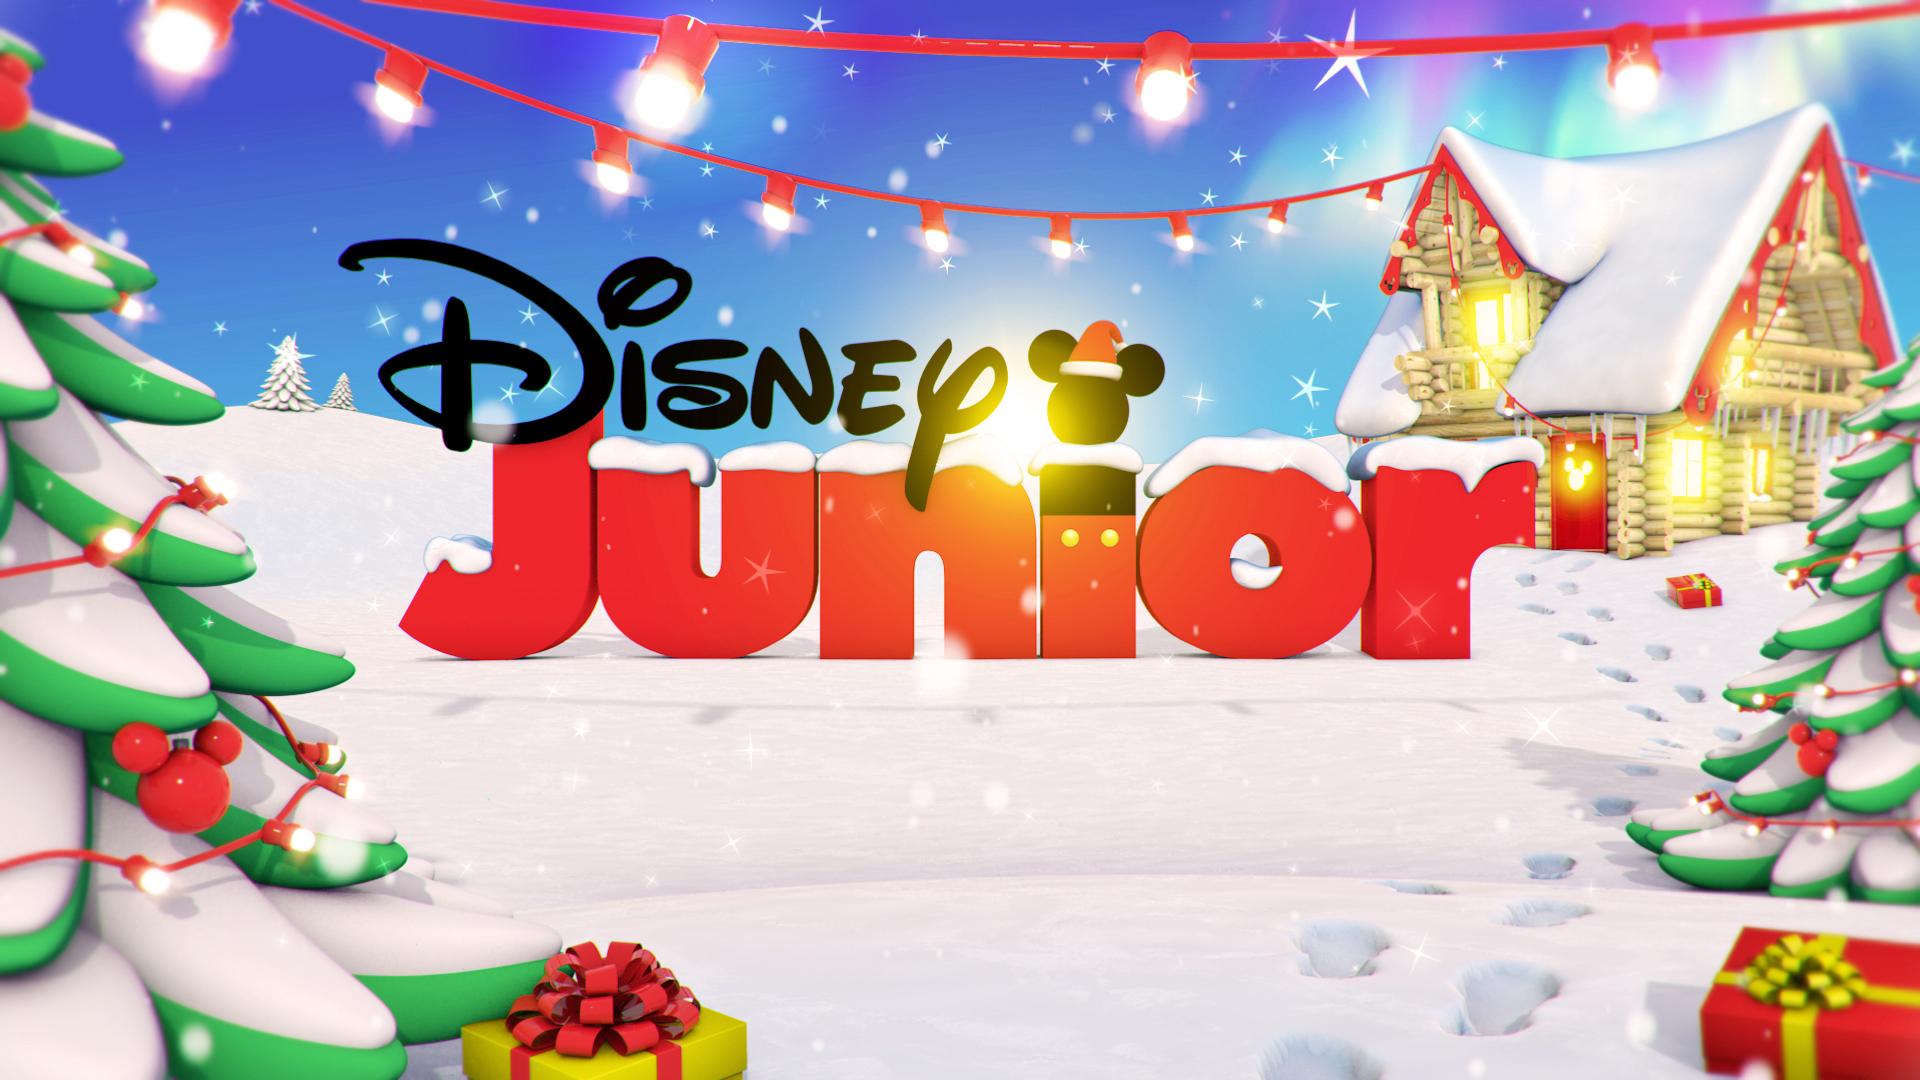 Disney Junior Christmas 2017